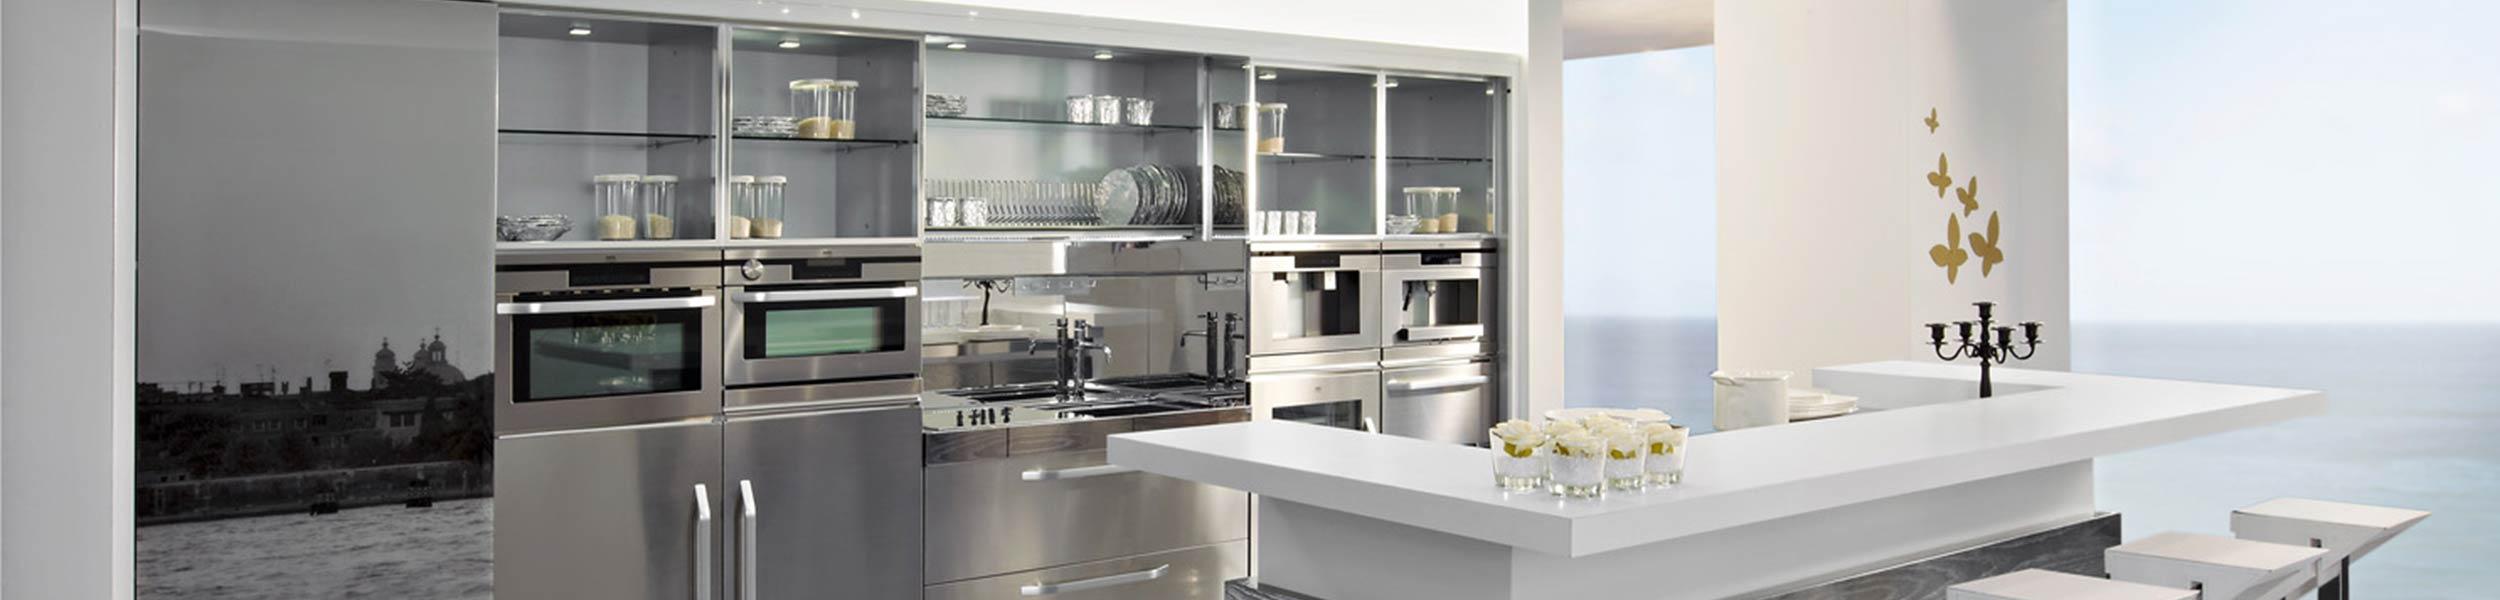 Ar tre cucine house organic roma - Cirelli arredo bagno ...